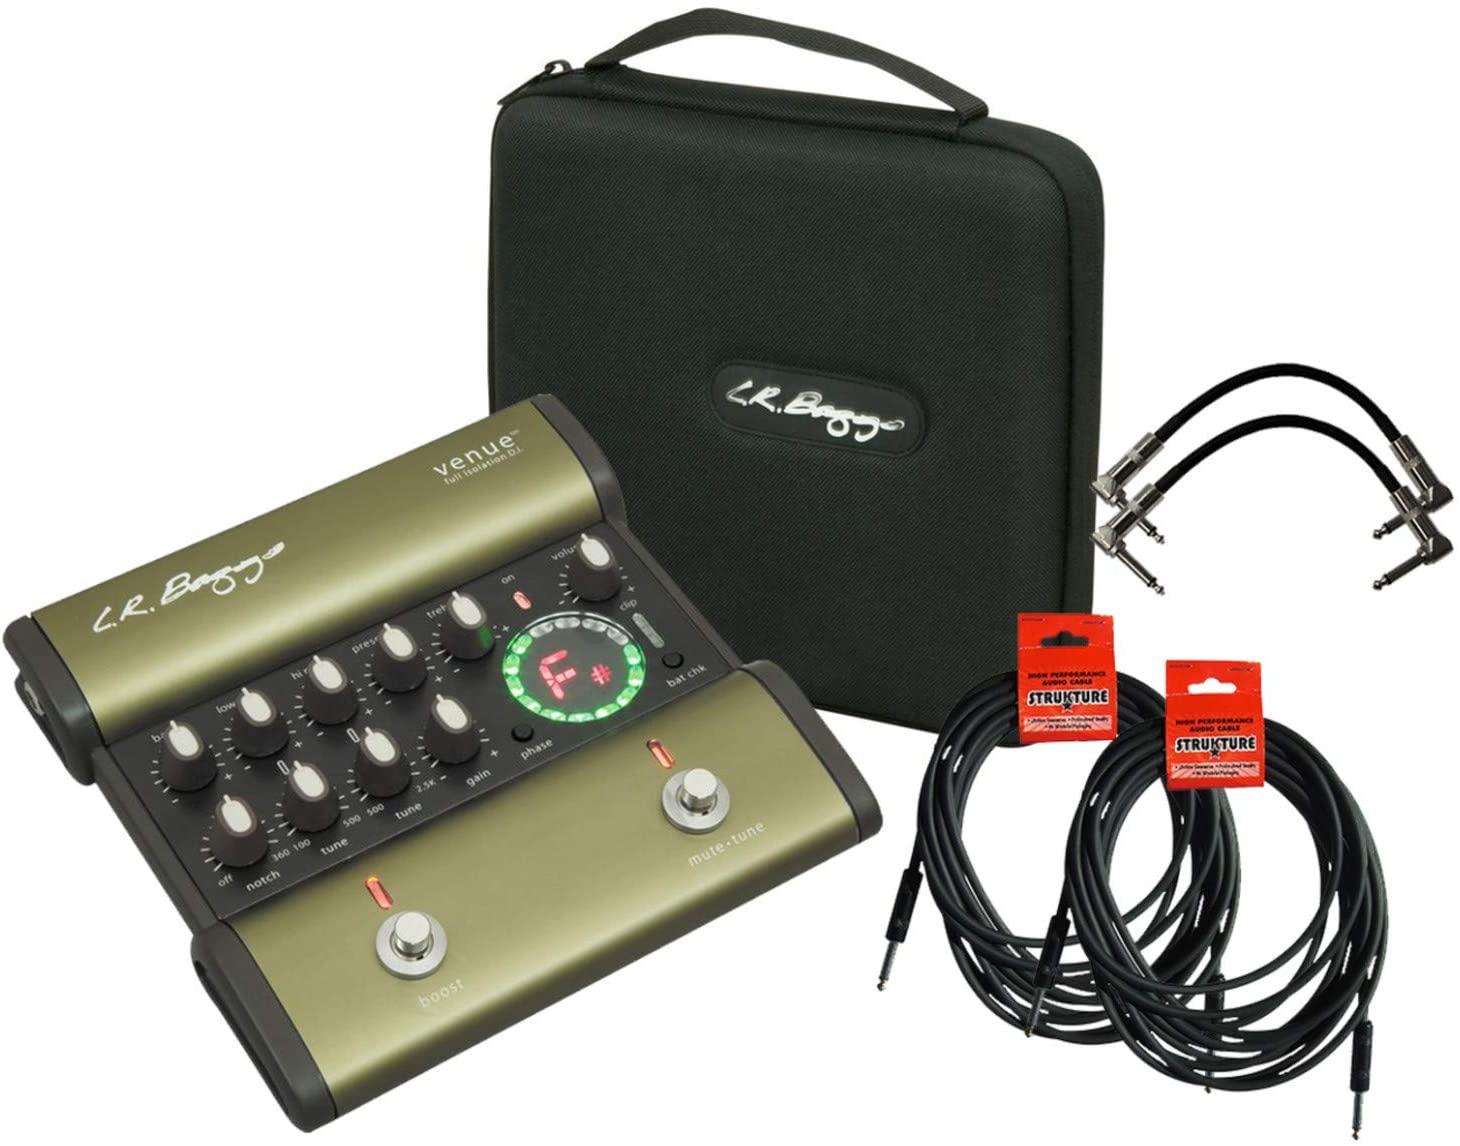 LR Baggs Venue DI Direct Box Footpedal Tuner w/ 4 Cables